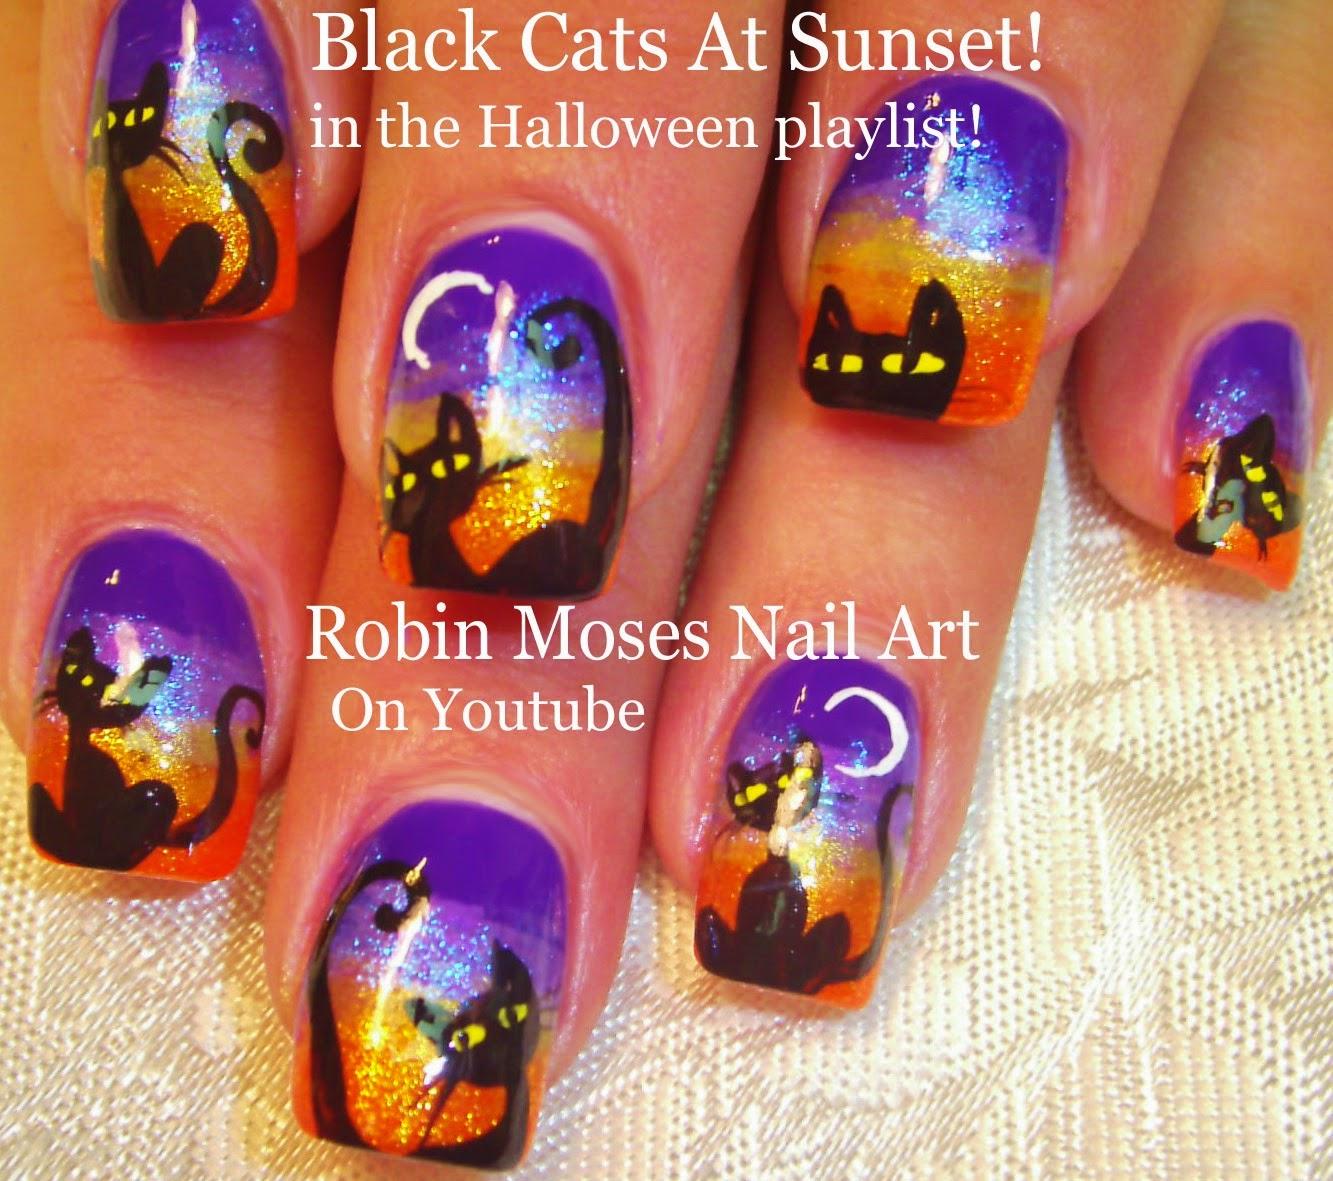 Robin moses nail art cat clip art halloween cats halloween 2 nail art tutorials diy halloween nails cute black cats moons prinsesfo Gallery